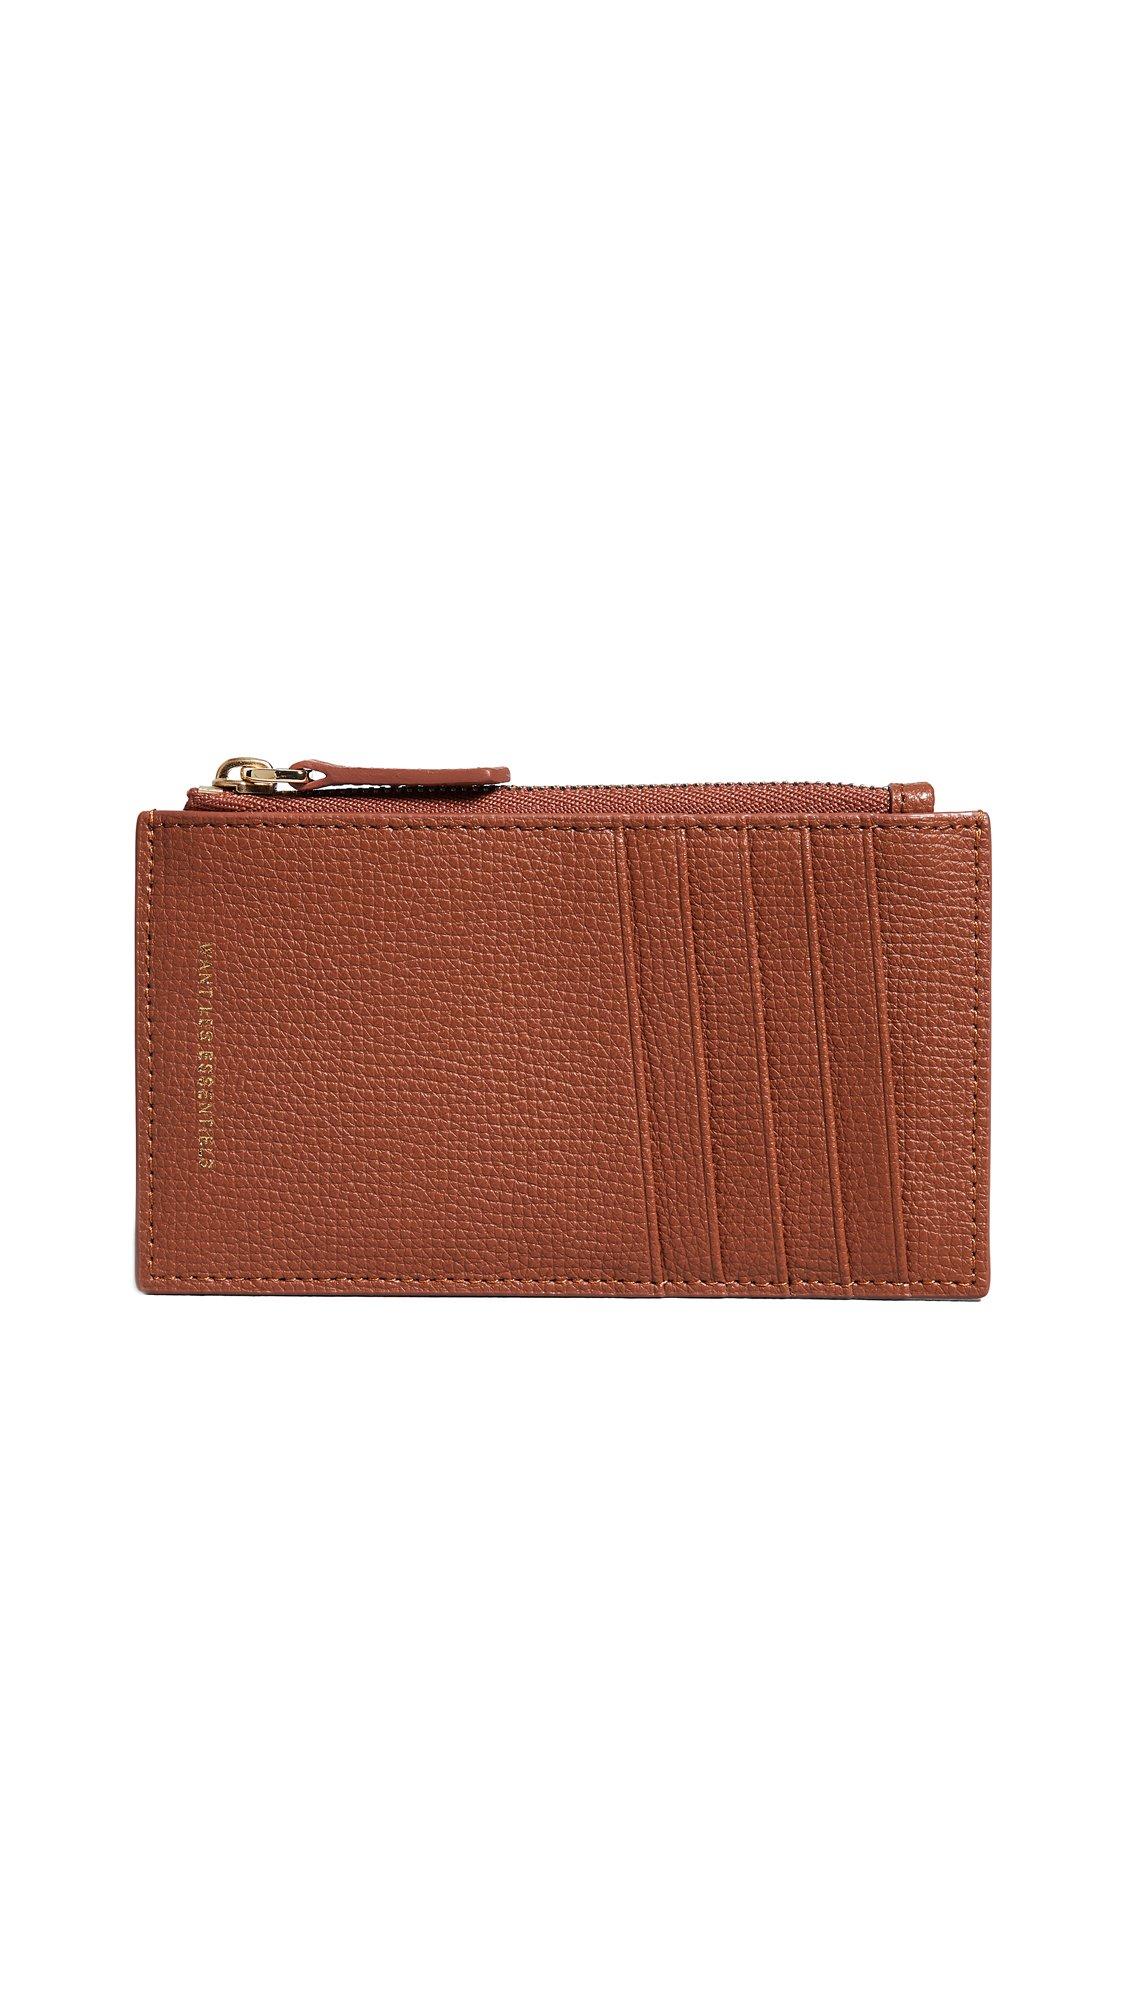 WANT LES ESSENTIELS Women's Adana Zipped Card Holder, Amber Grain, One Size by WANT LES ESSENTIELS